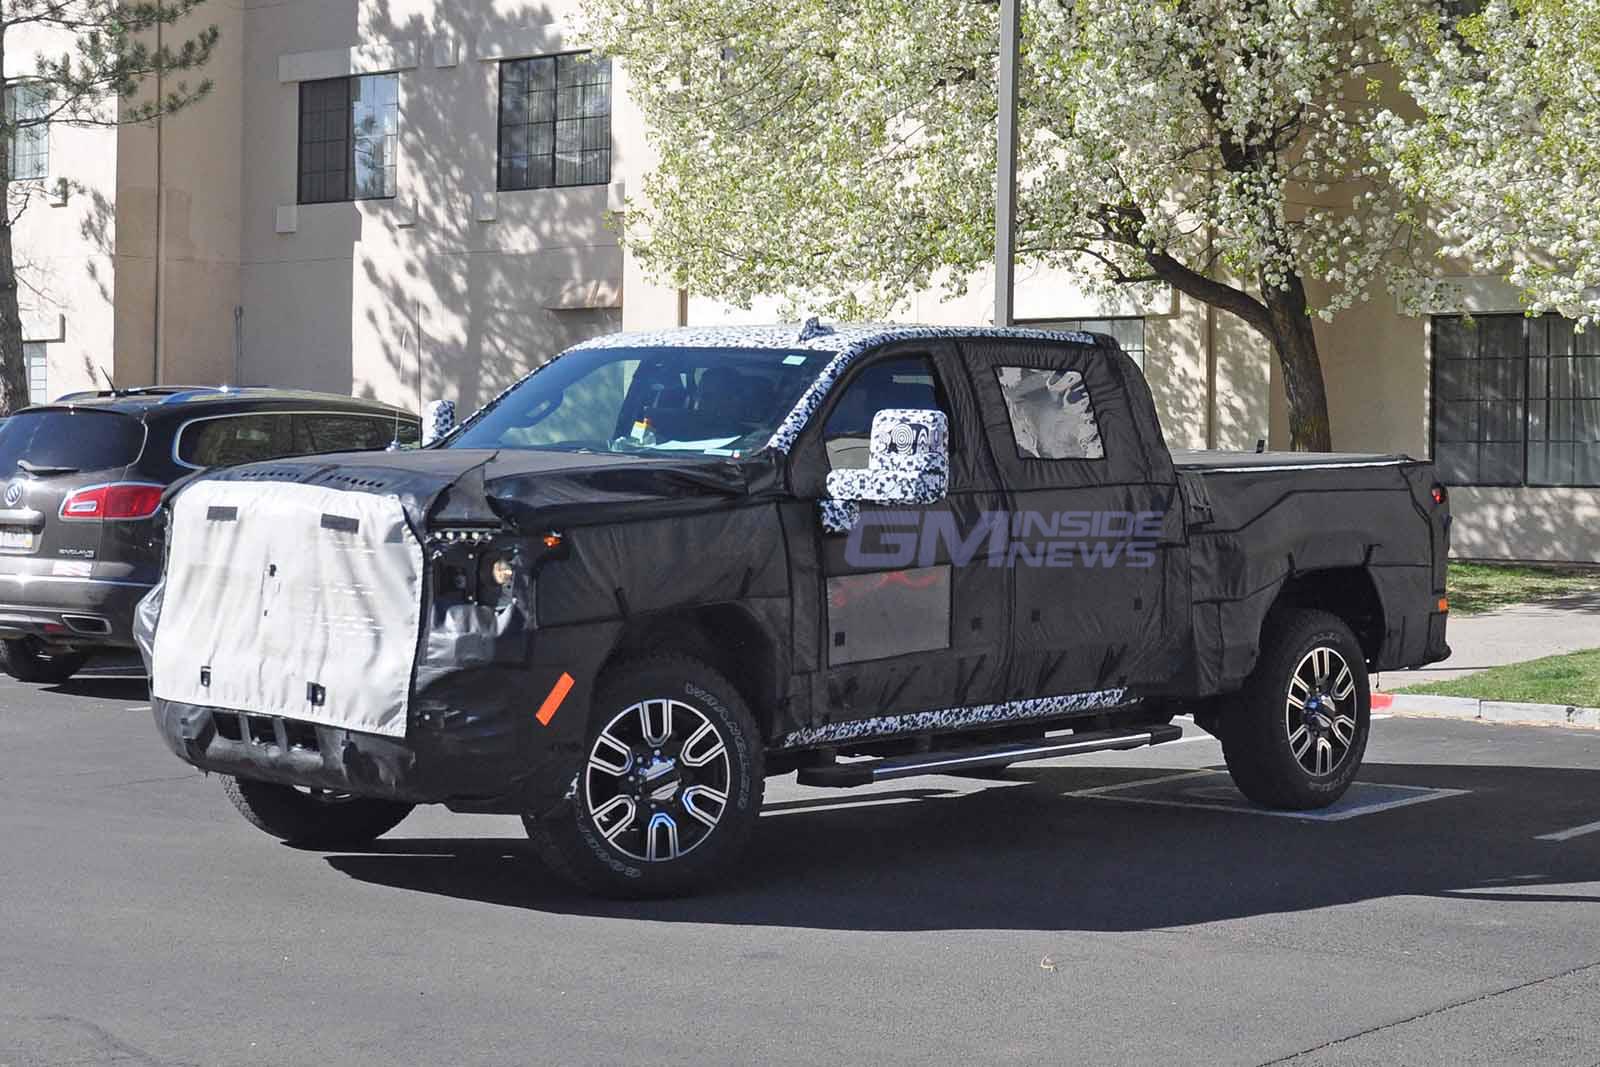 2020 GMC Sierra Denali 2500 HD Crew Cab Spied for the ...